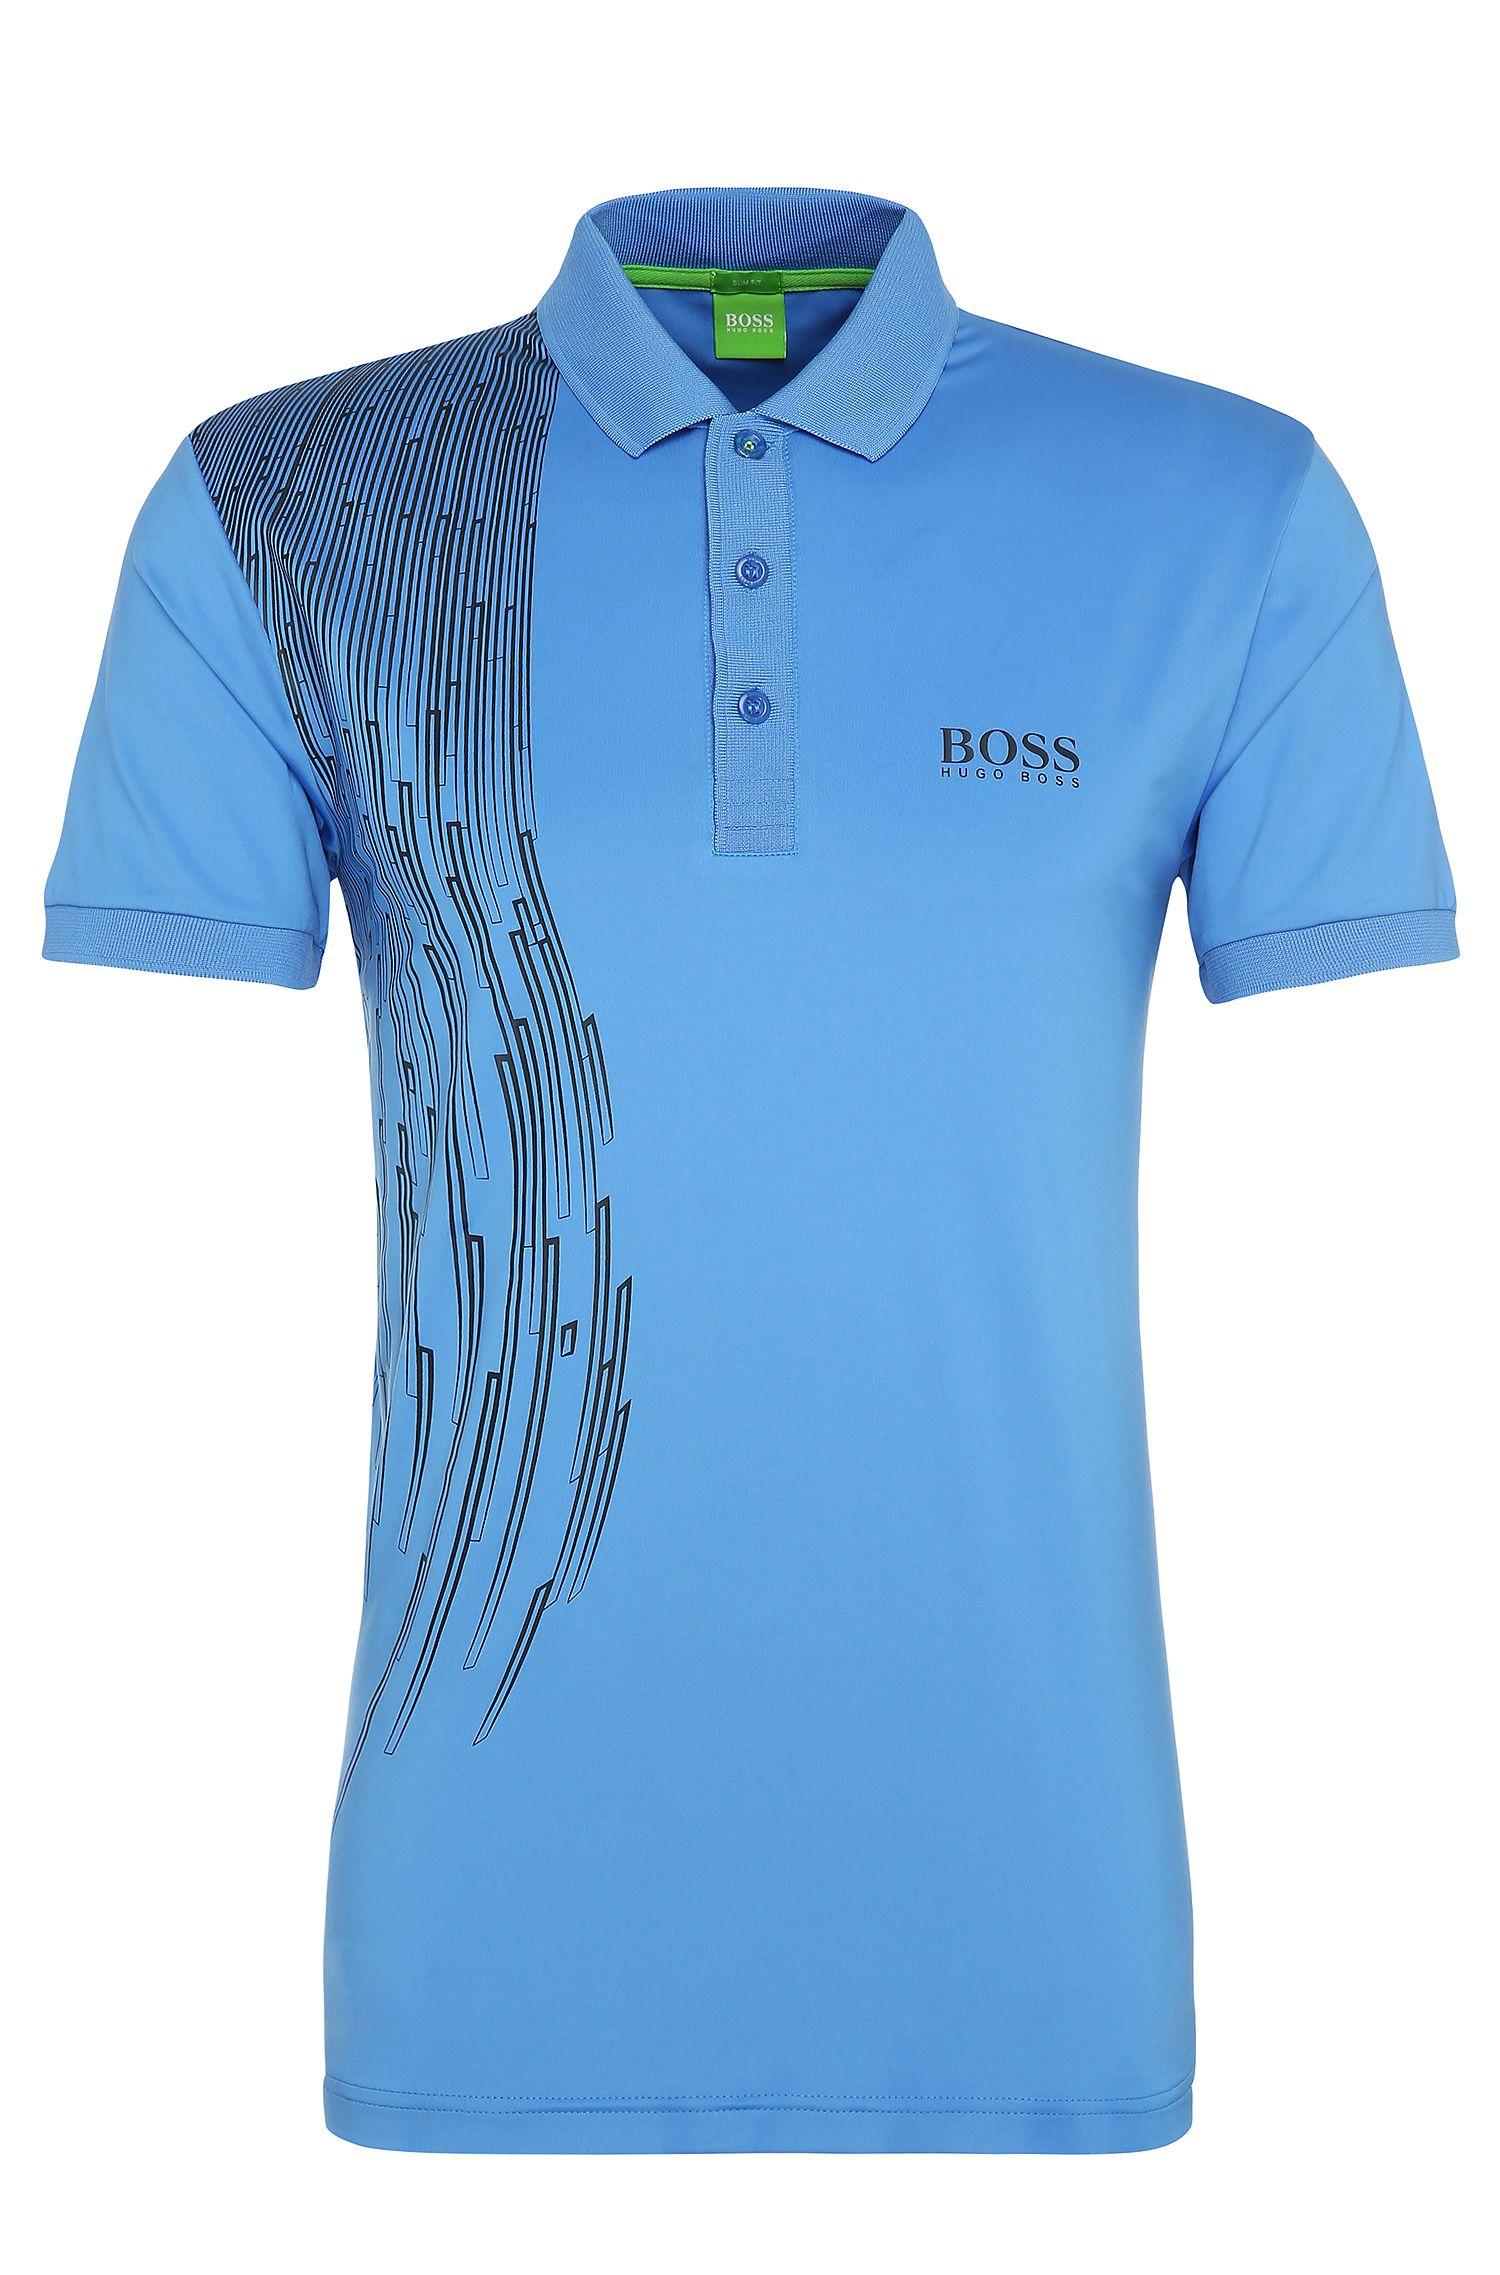 'Paule Pro 3' | Slim Fit, Printed Polo Shirt